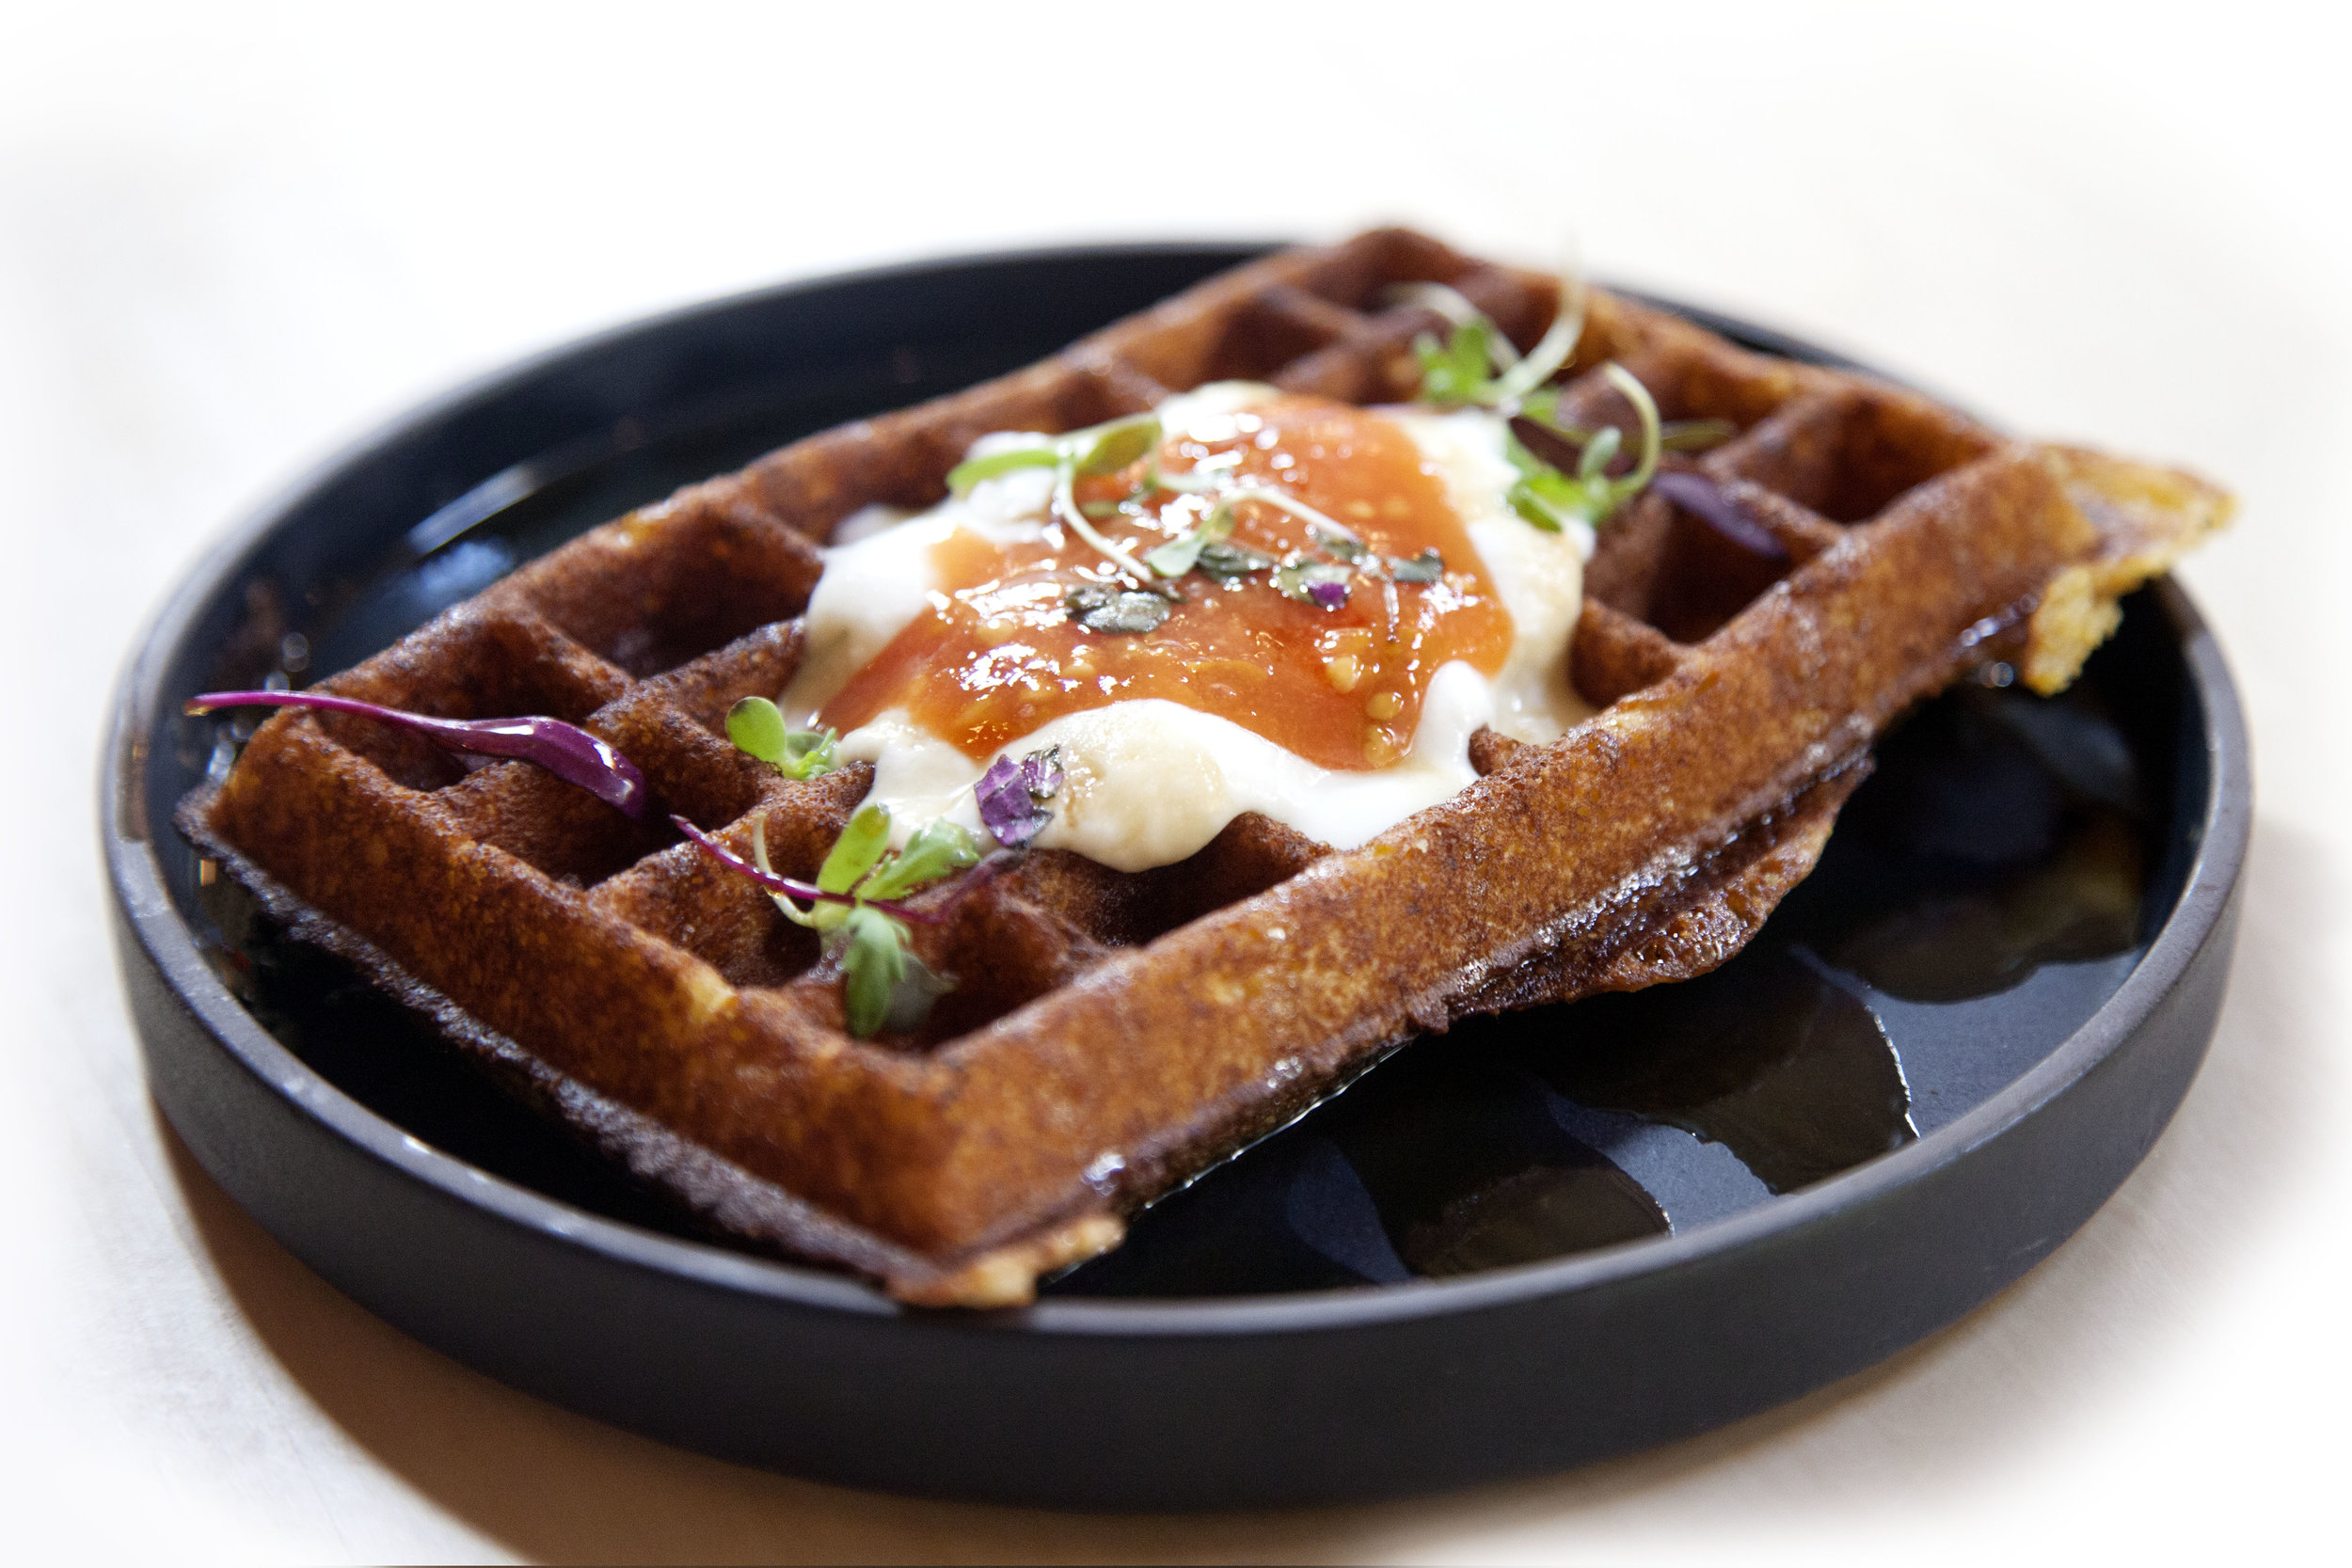 Heirloom Cornmeal Waffle